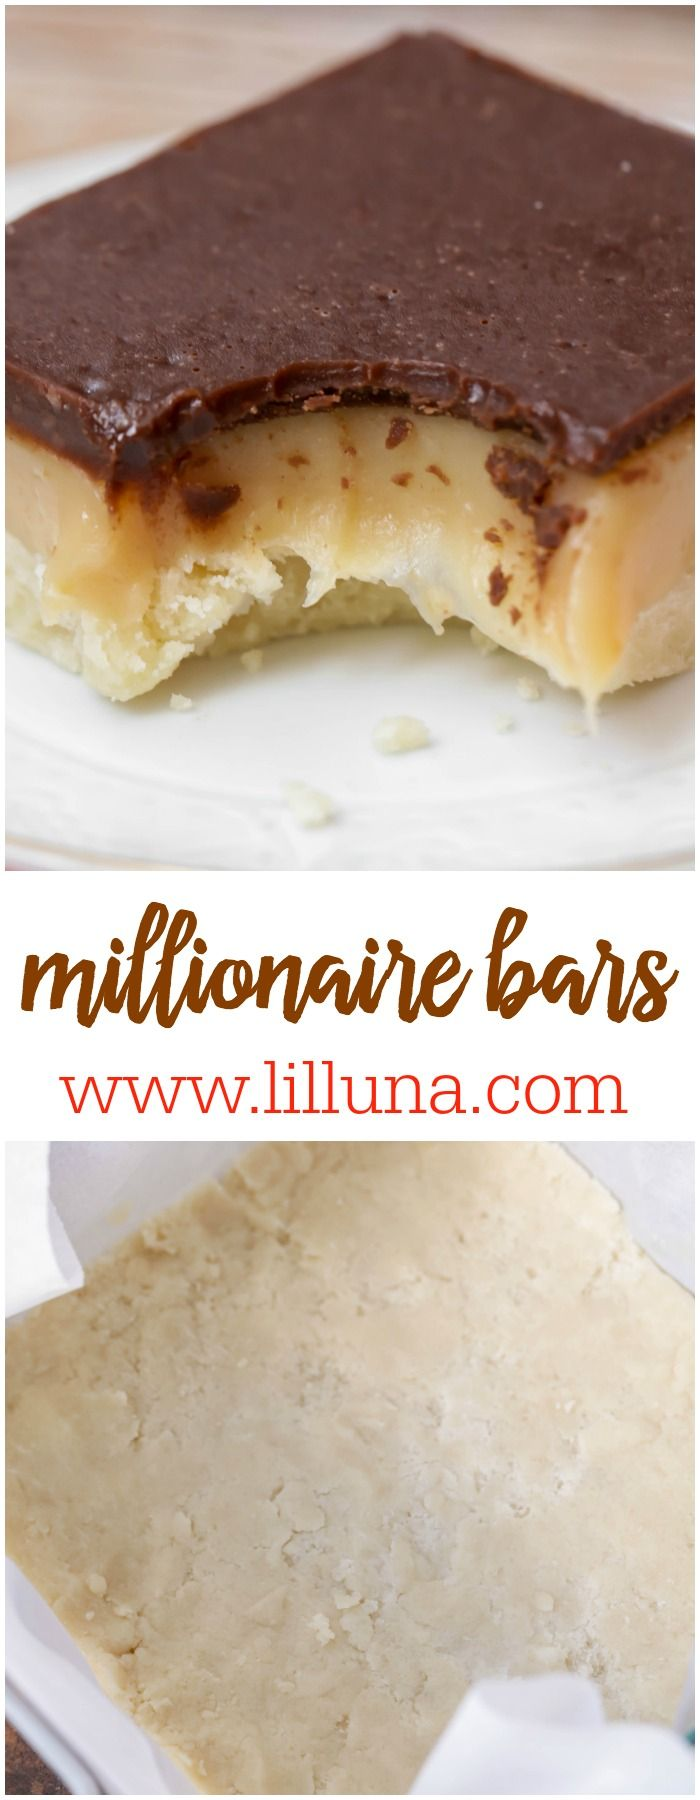 Millionaire Bars - Lil' Luna